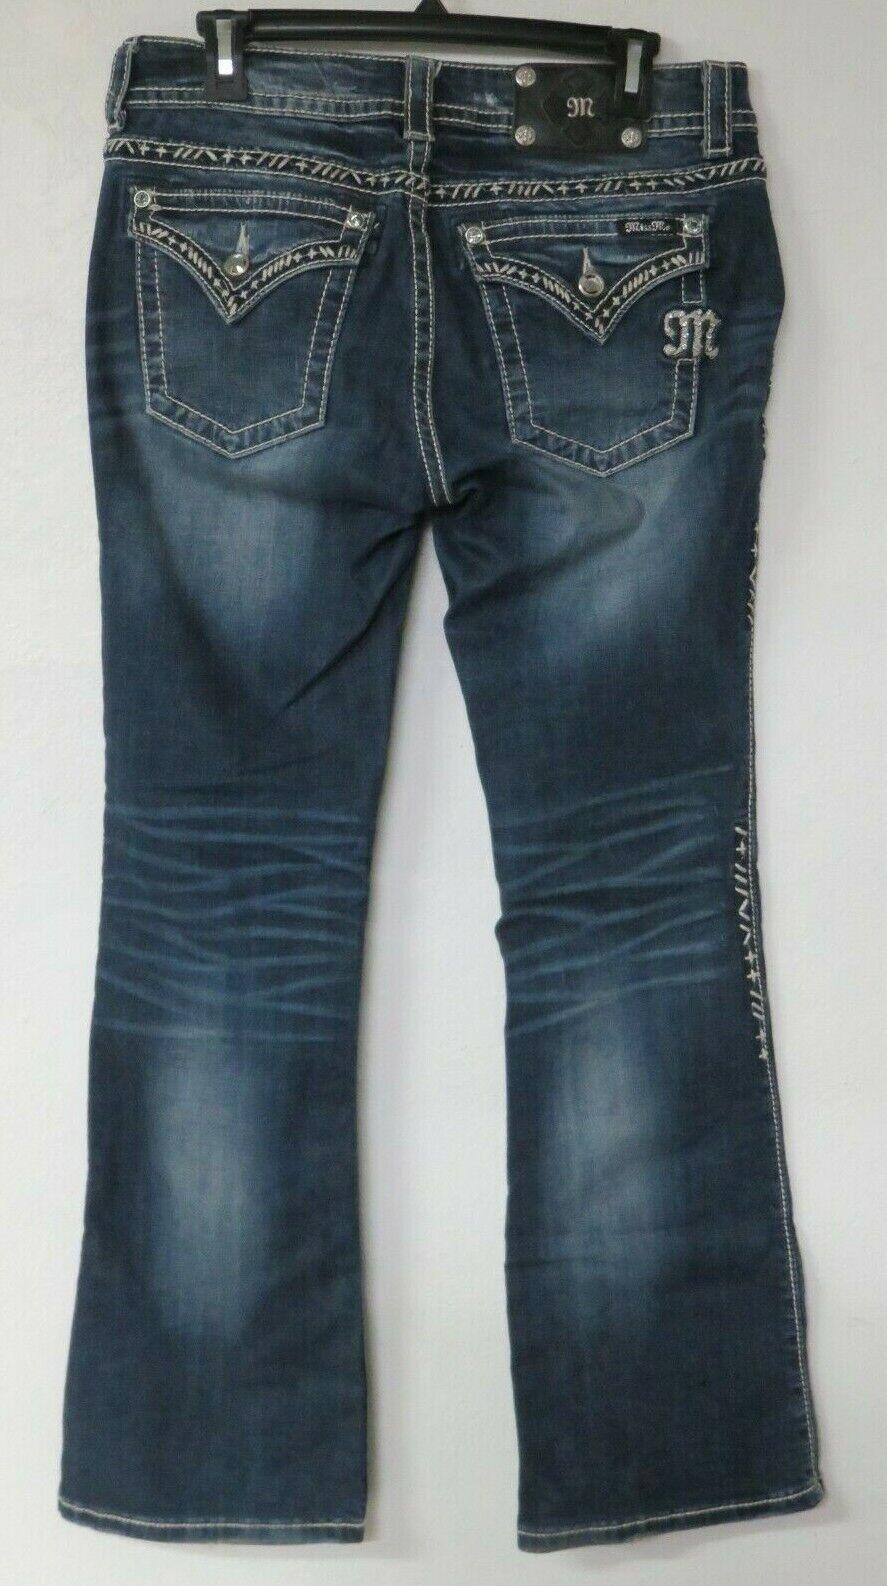 Miss Me Jeans Pants bluee Size 30 x 31 Cotton Blend Je8022BR Boot Cut Style